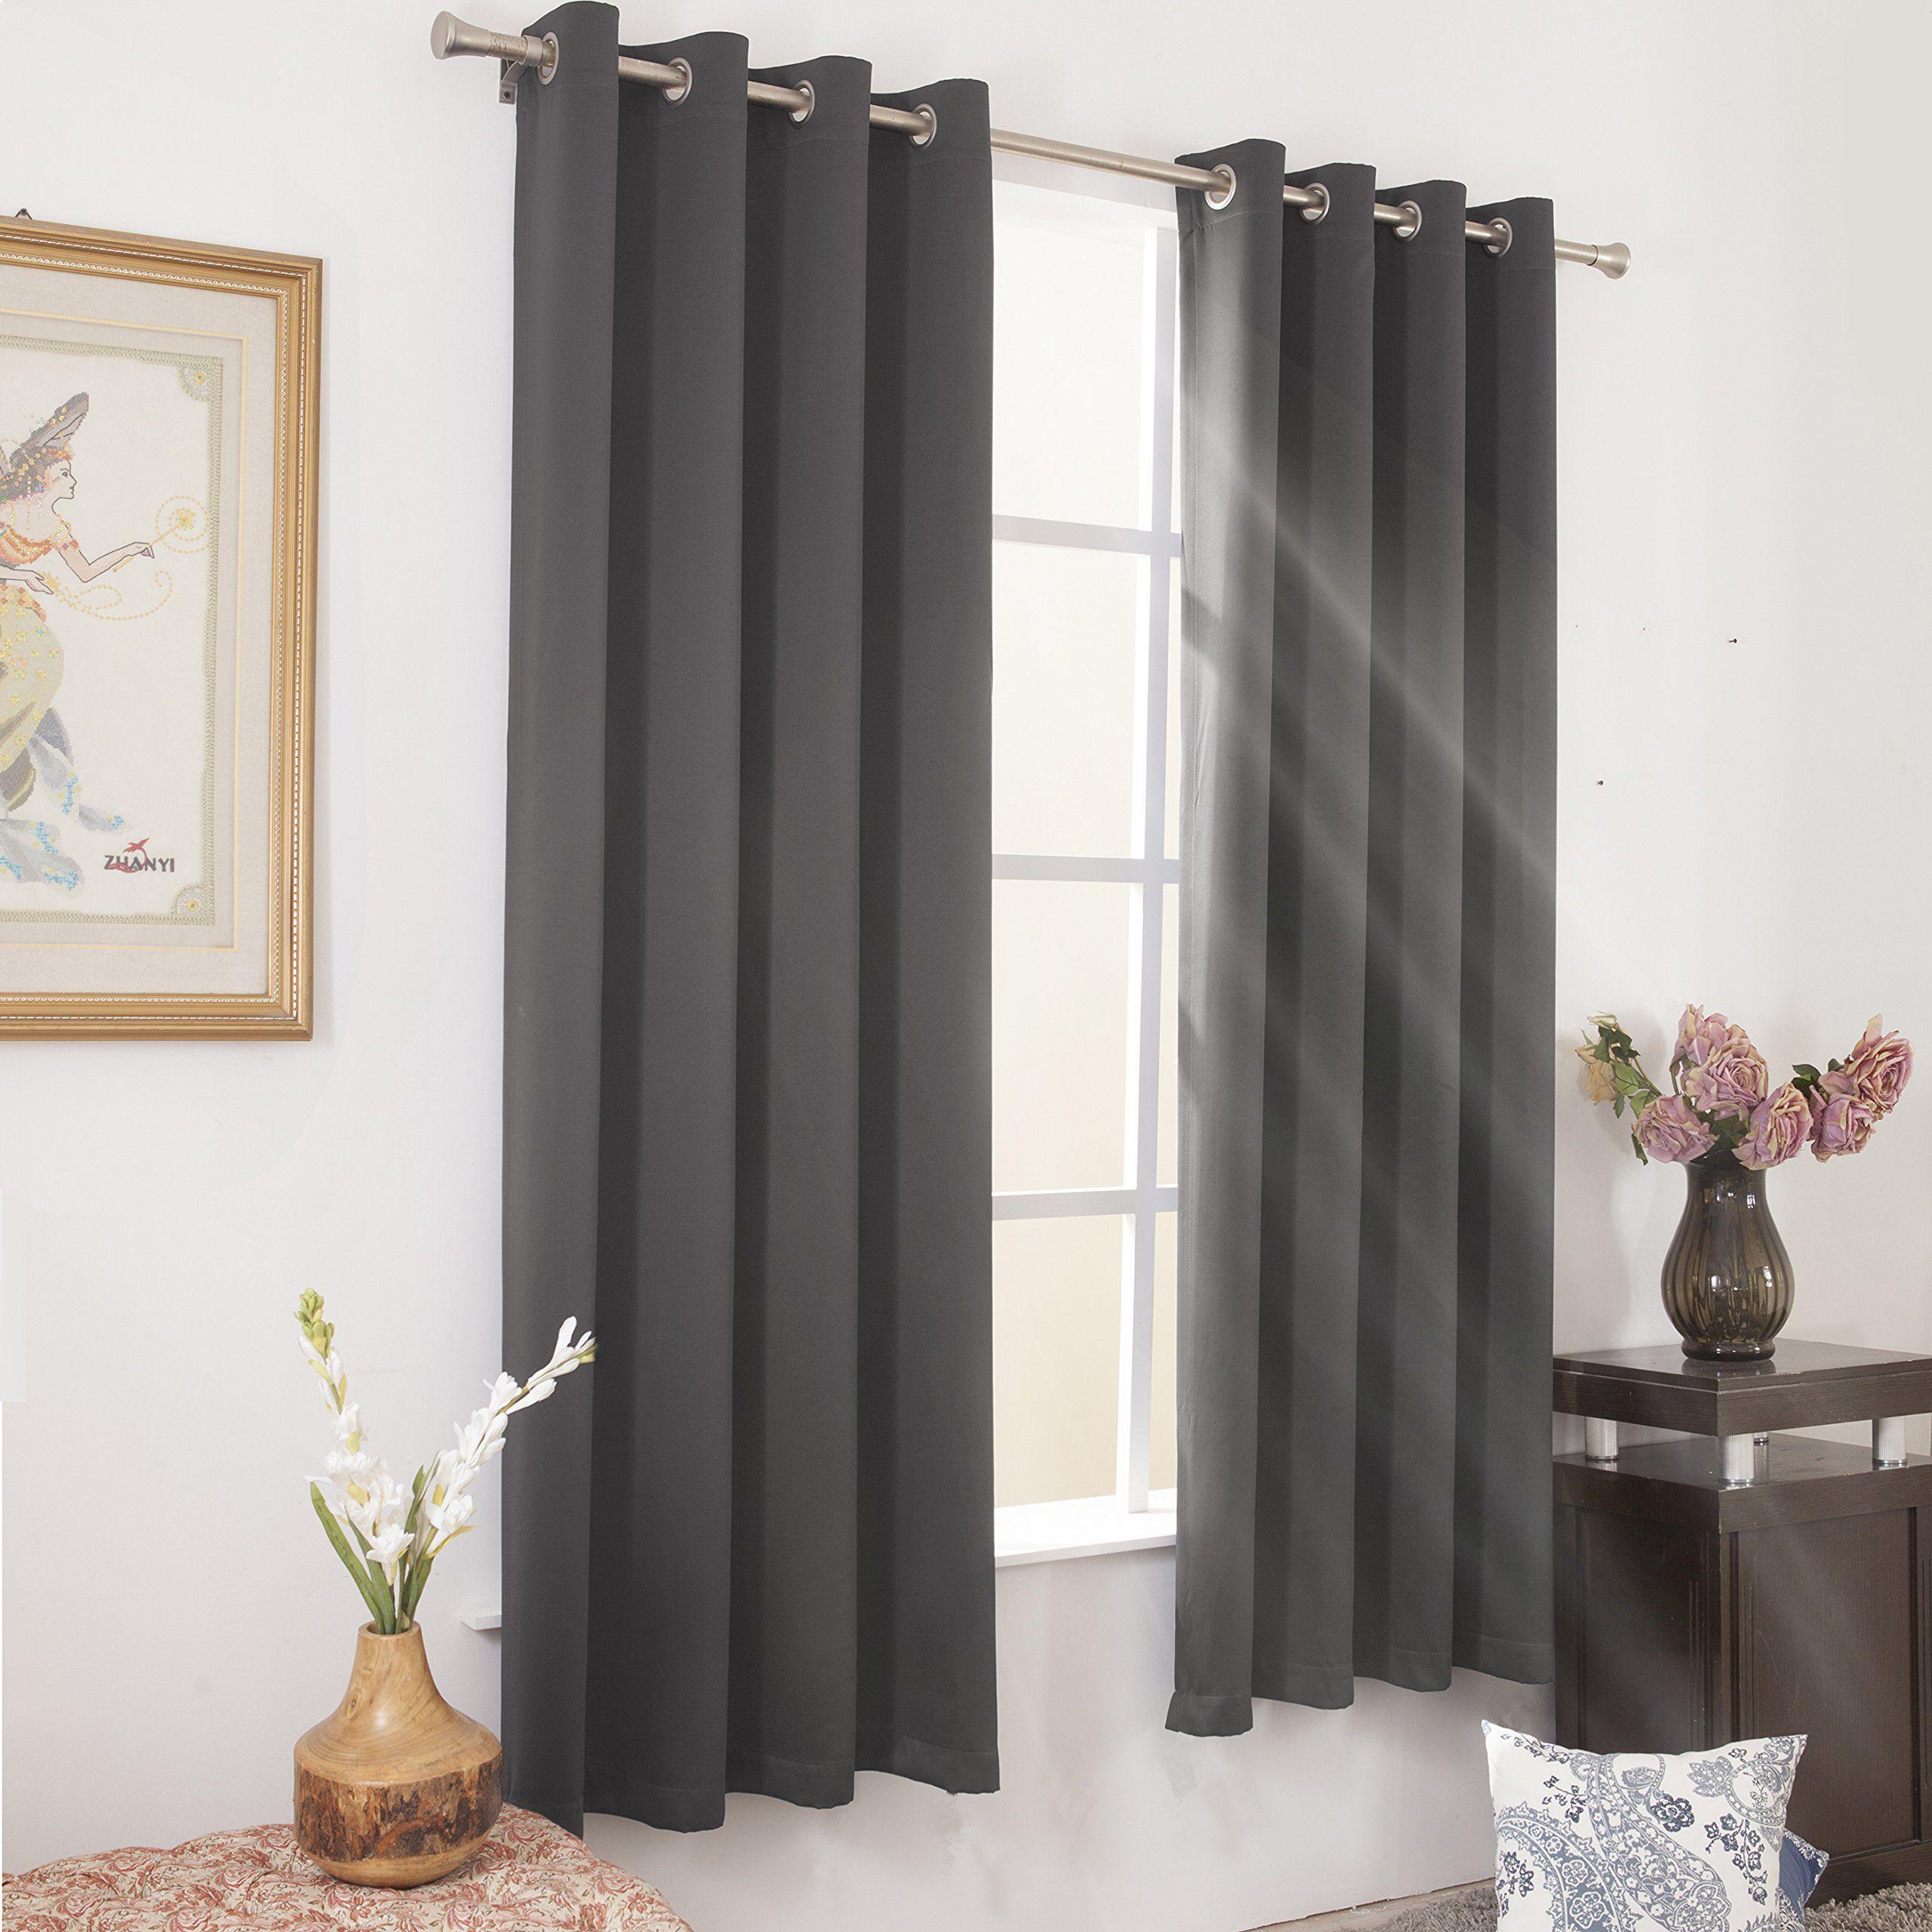 Short Blackout Curtains For Bedroom Http Www Otoseriilan Com Window Treatments Bedroom Curtains Bedroom Thermal Curtains #thermal #curtains #for #living #room